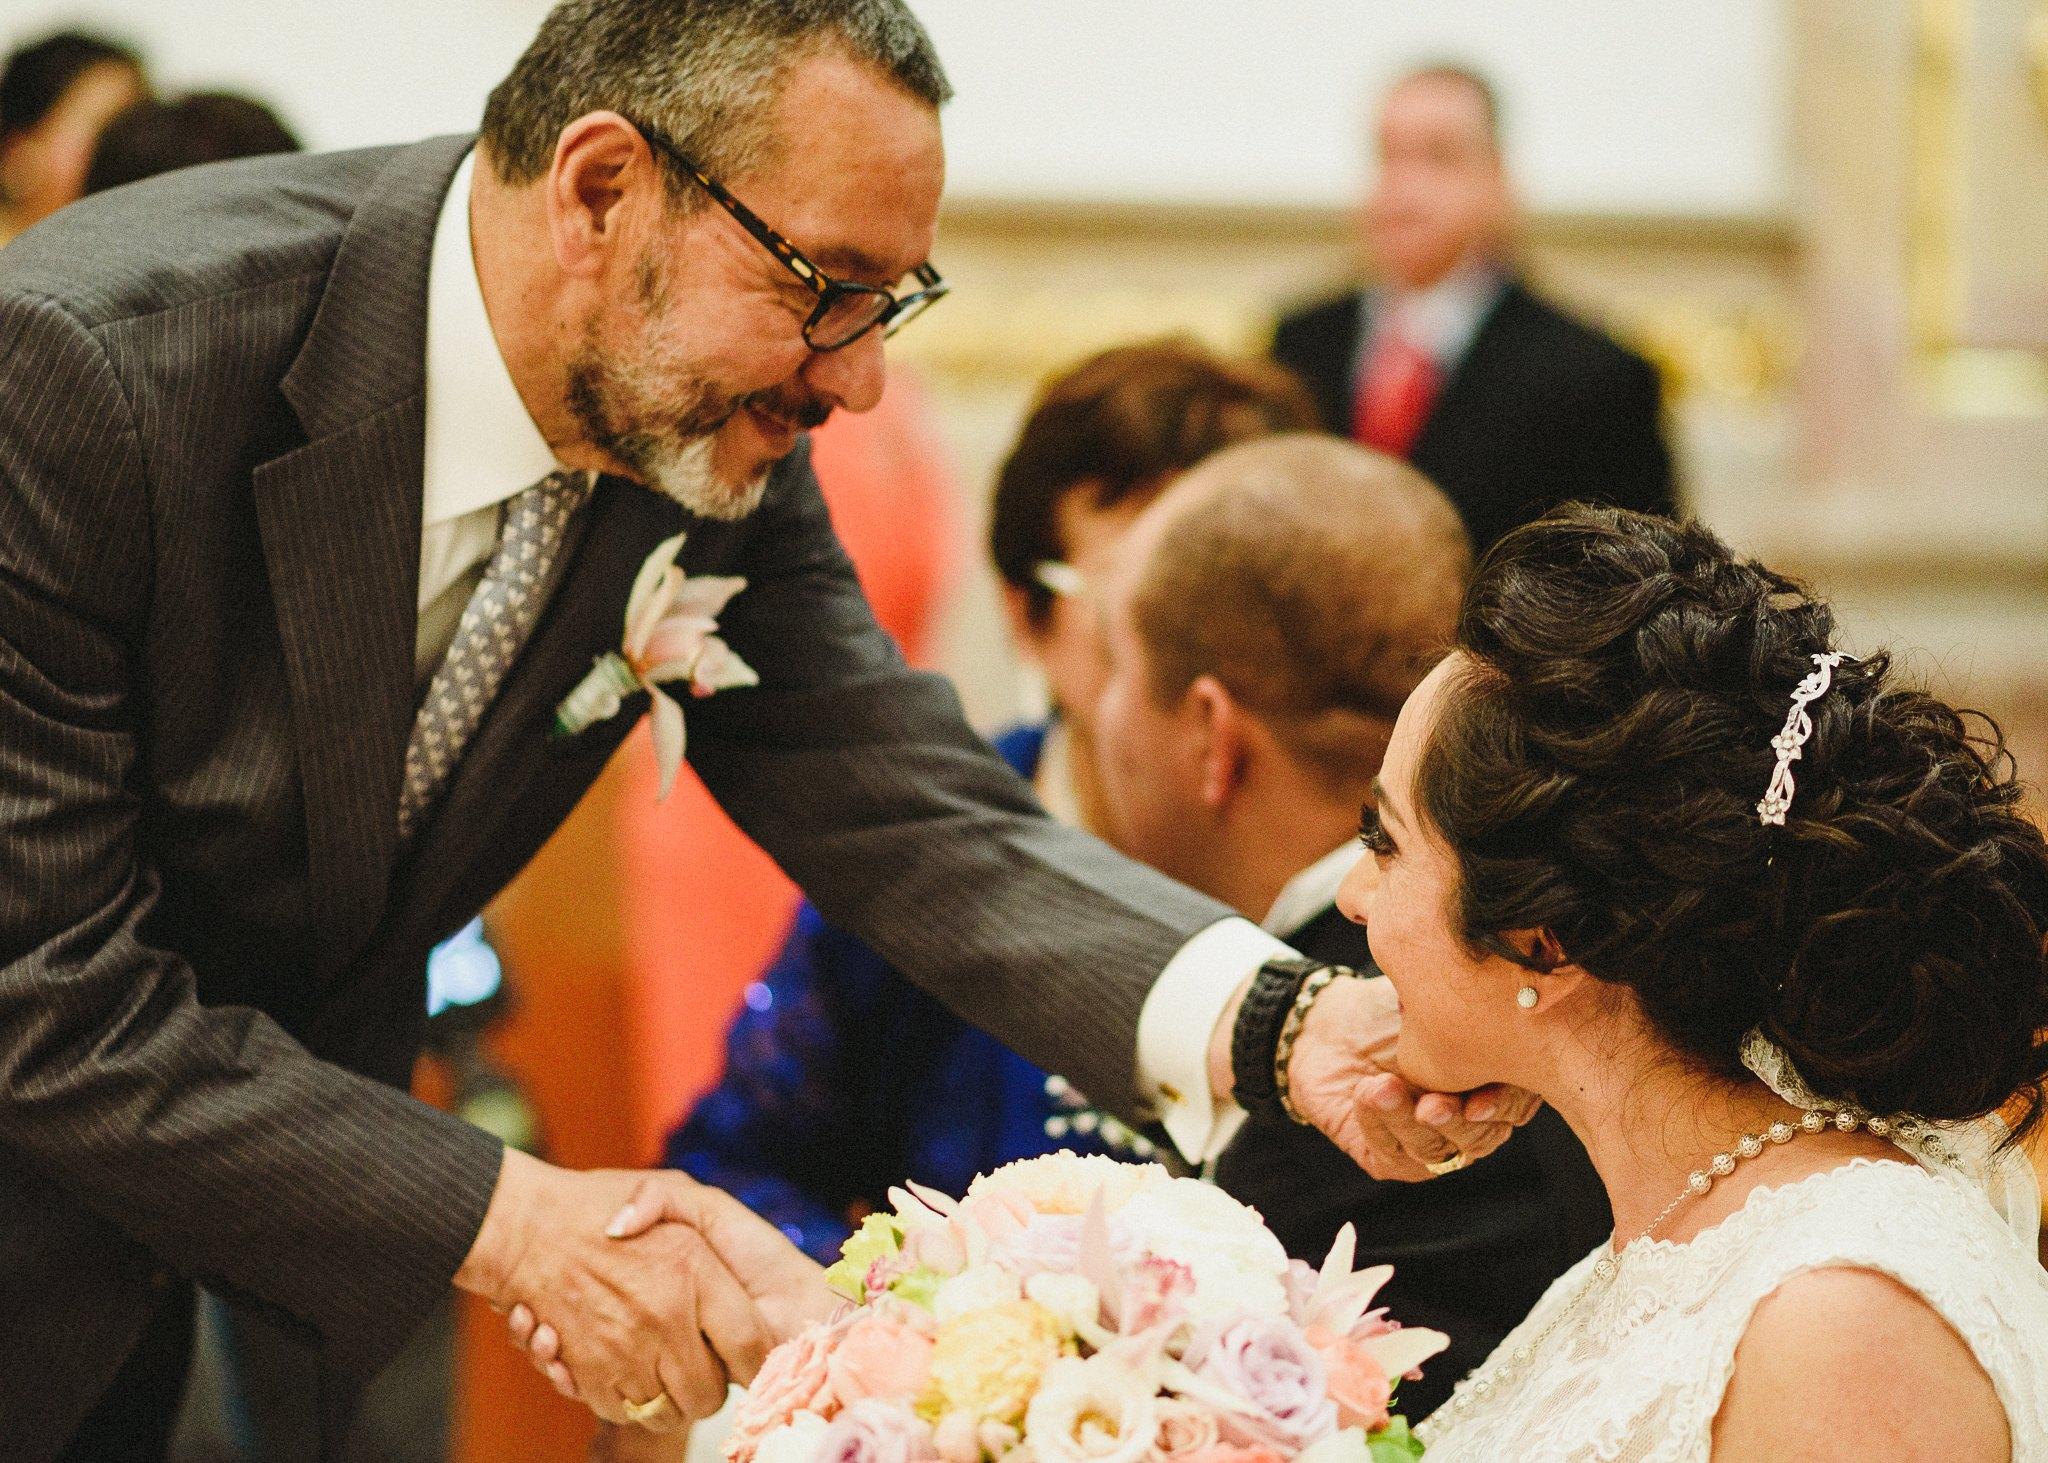 Wedding-Boda-Tulancingo-Hidalgo-Salon-Essenzia-Luis-Houdin-30-film